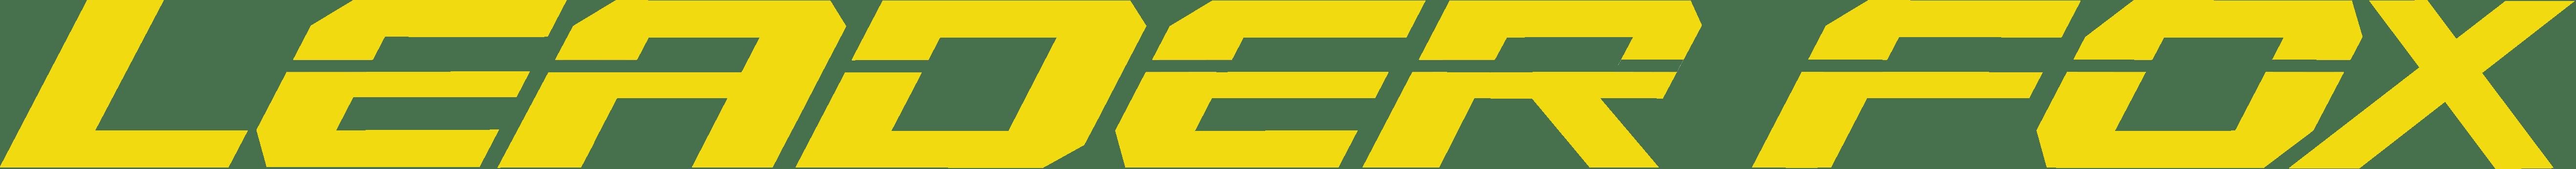 LOGO-LF-2018-zluta